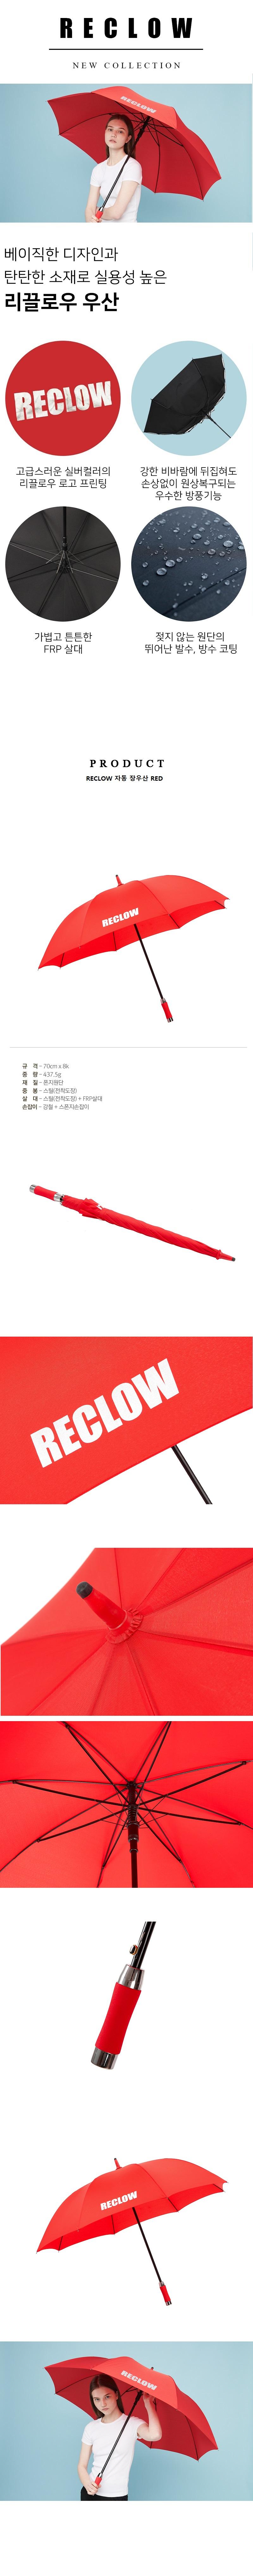 RECLOW 자동 장우산 RED.jpg